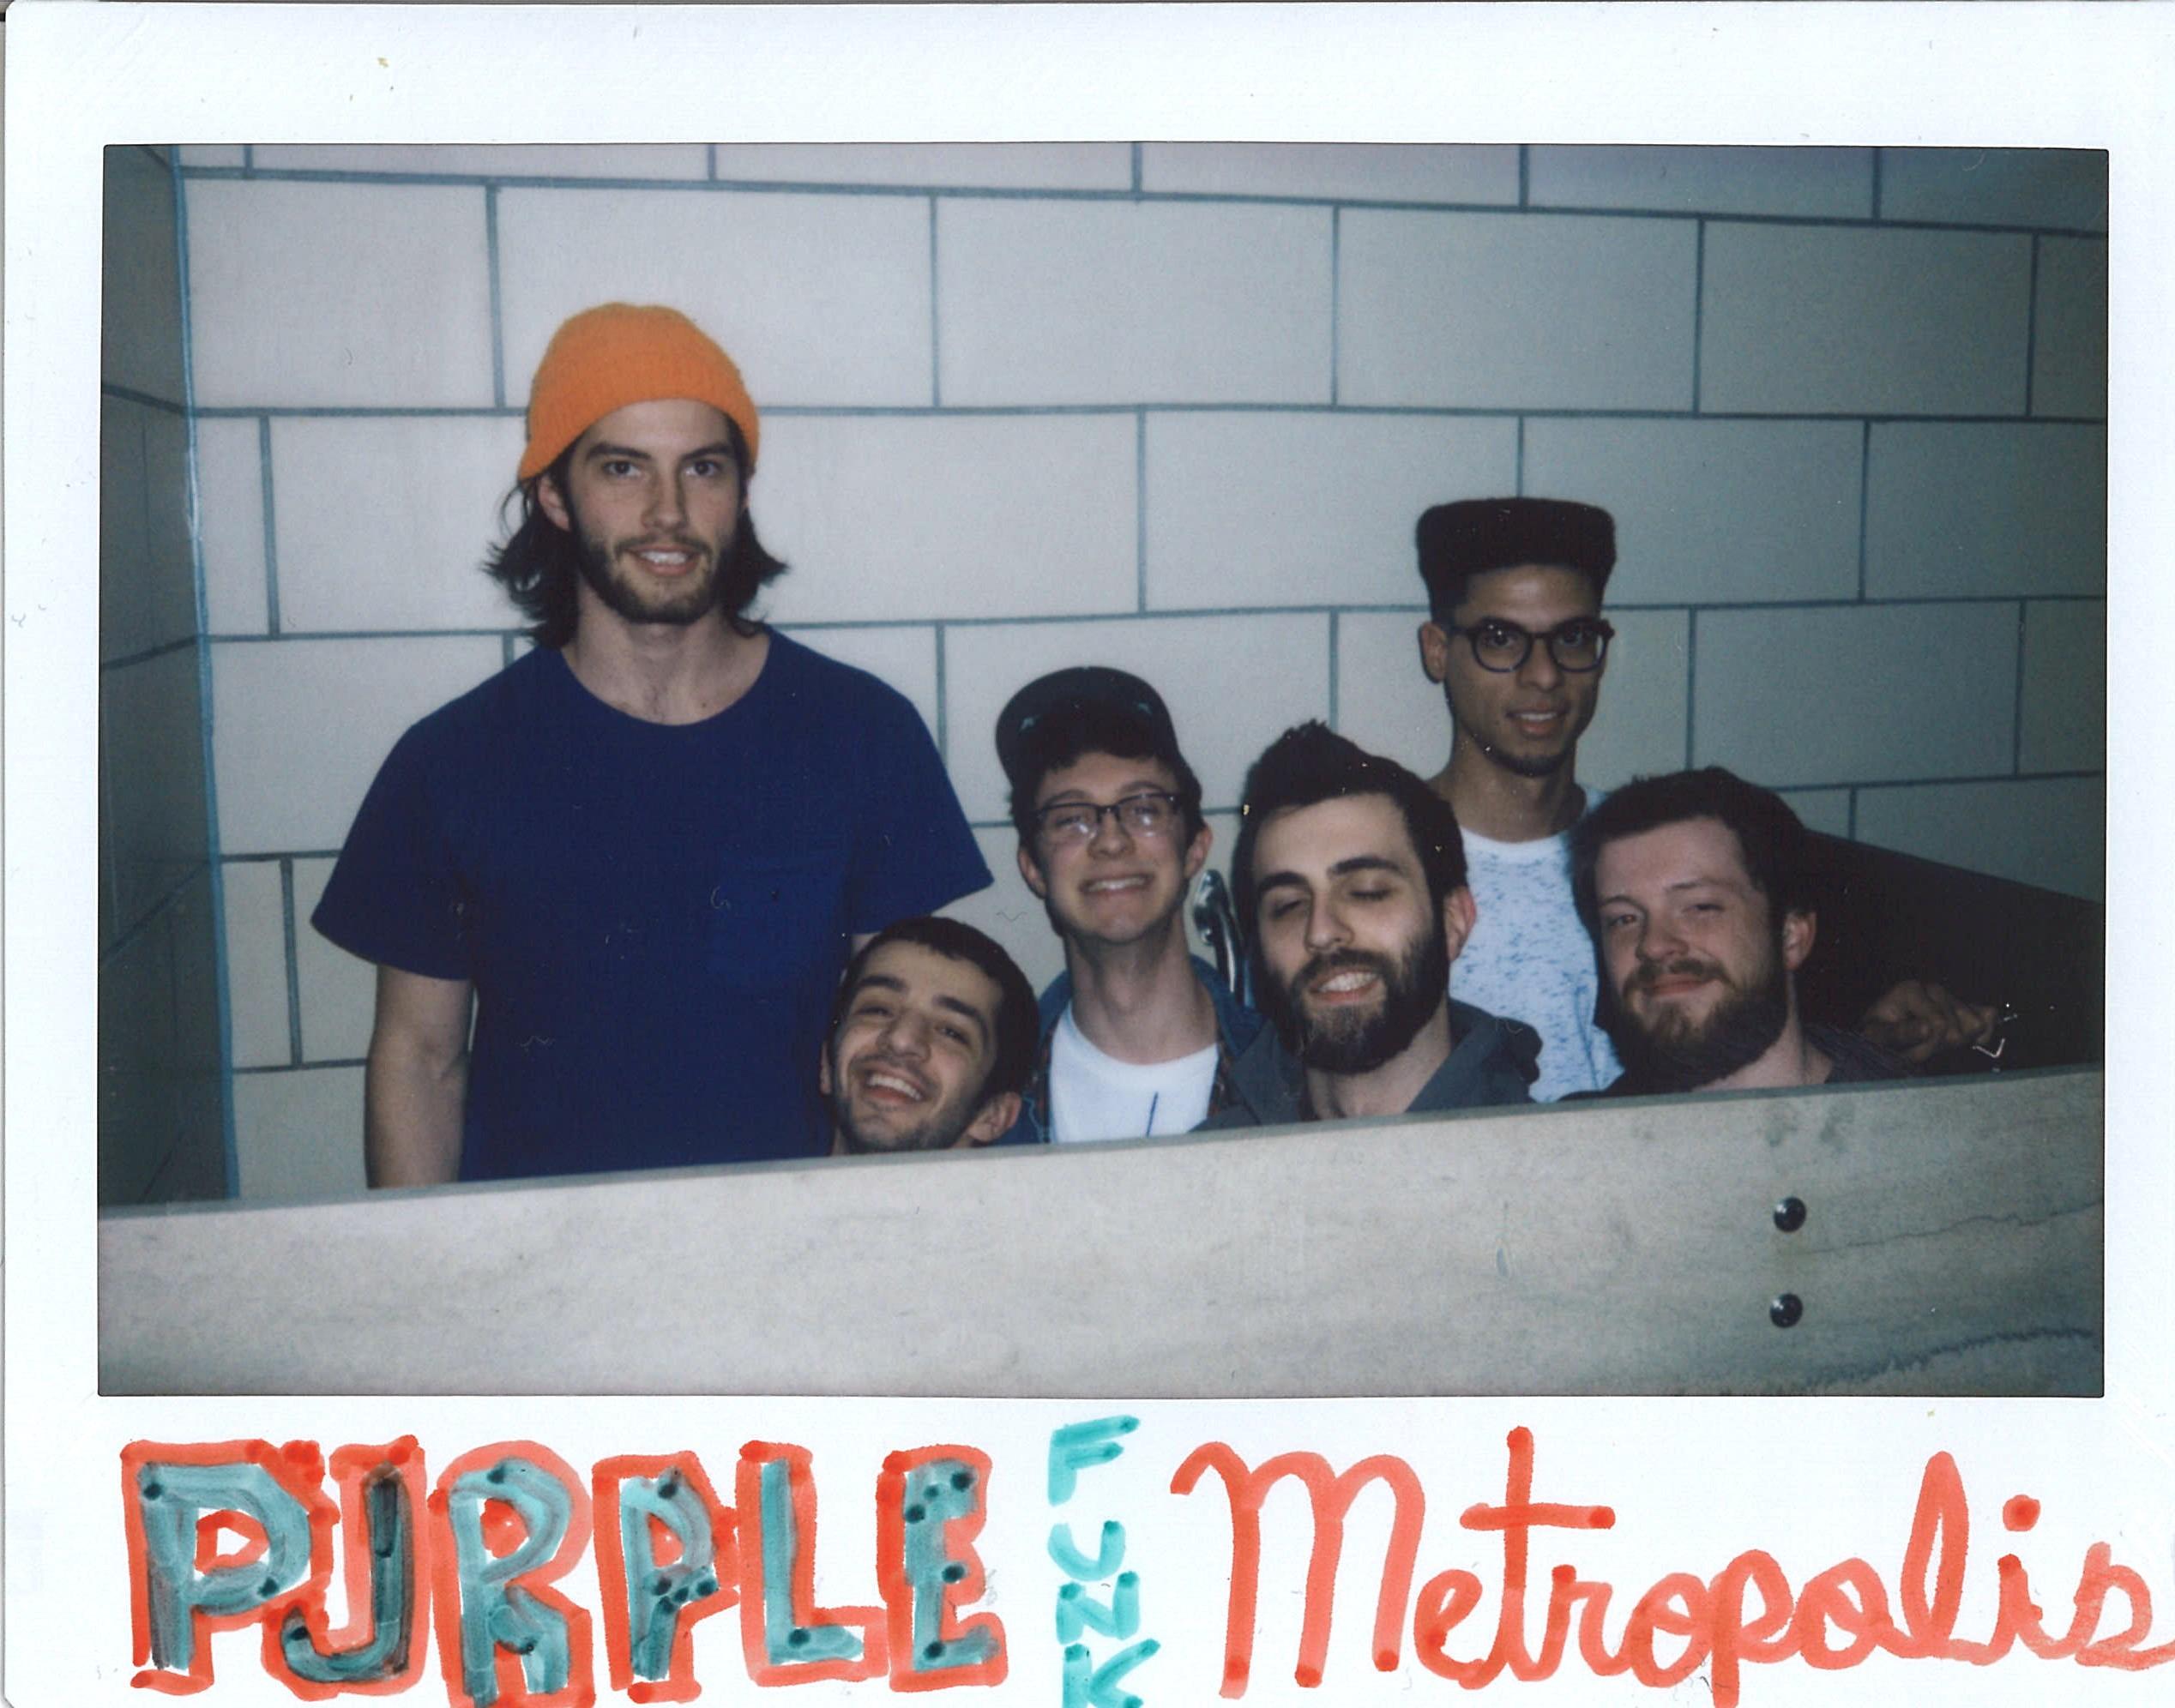 Purple Funk Metropolis